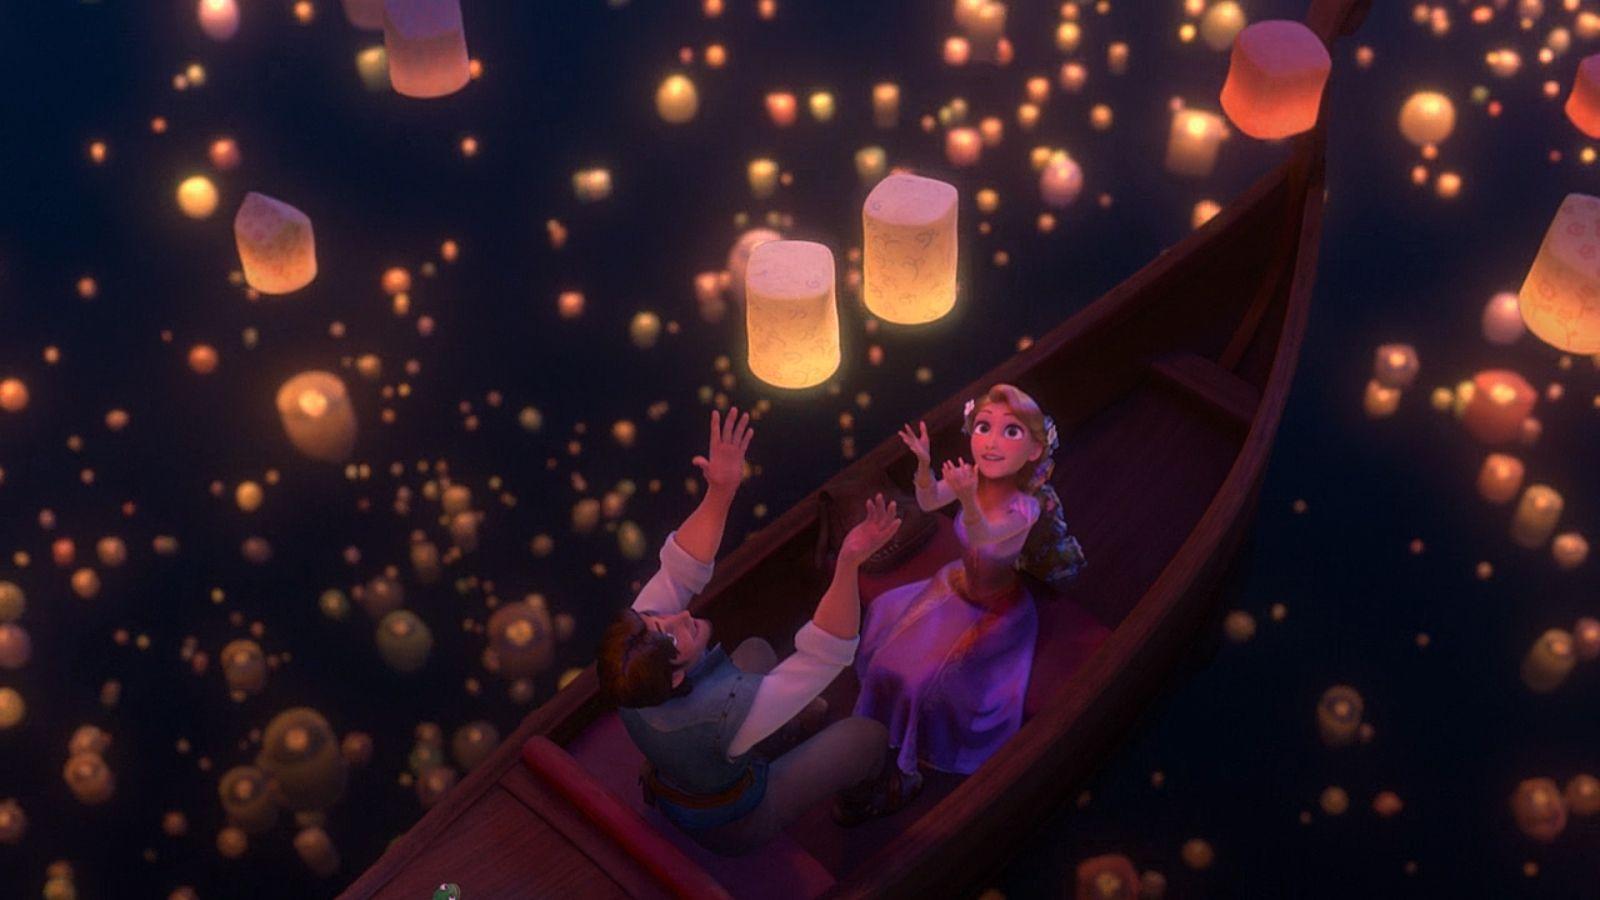 Magic - from Tangled | Rapunzel | Pinterest | Tangled wallpaper, Hd ... for Rapunzel Tangled Lantern Wallpaper  67qdu